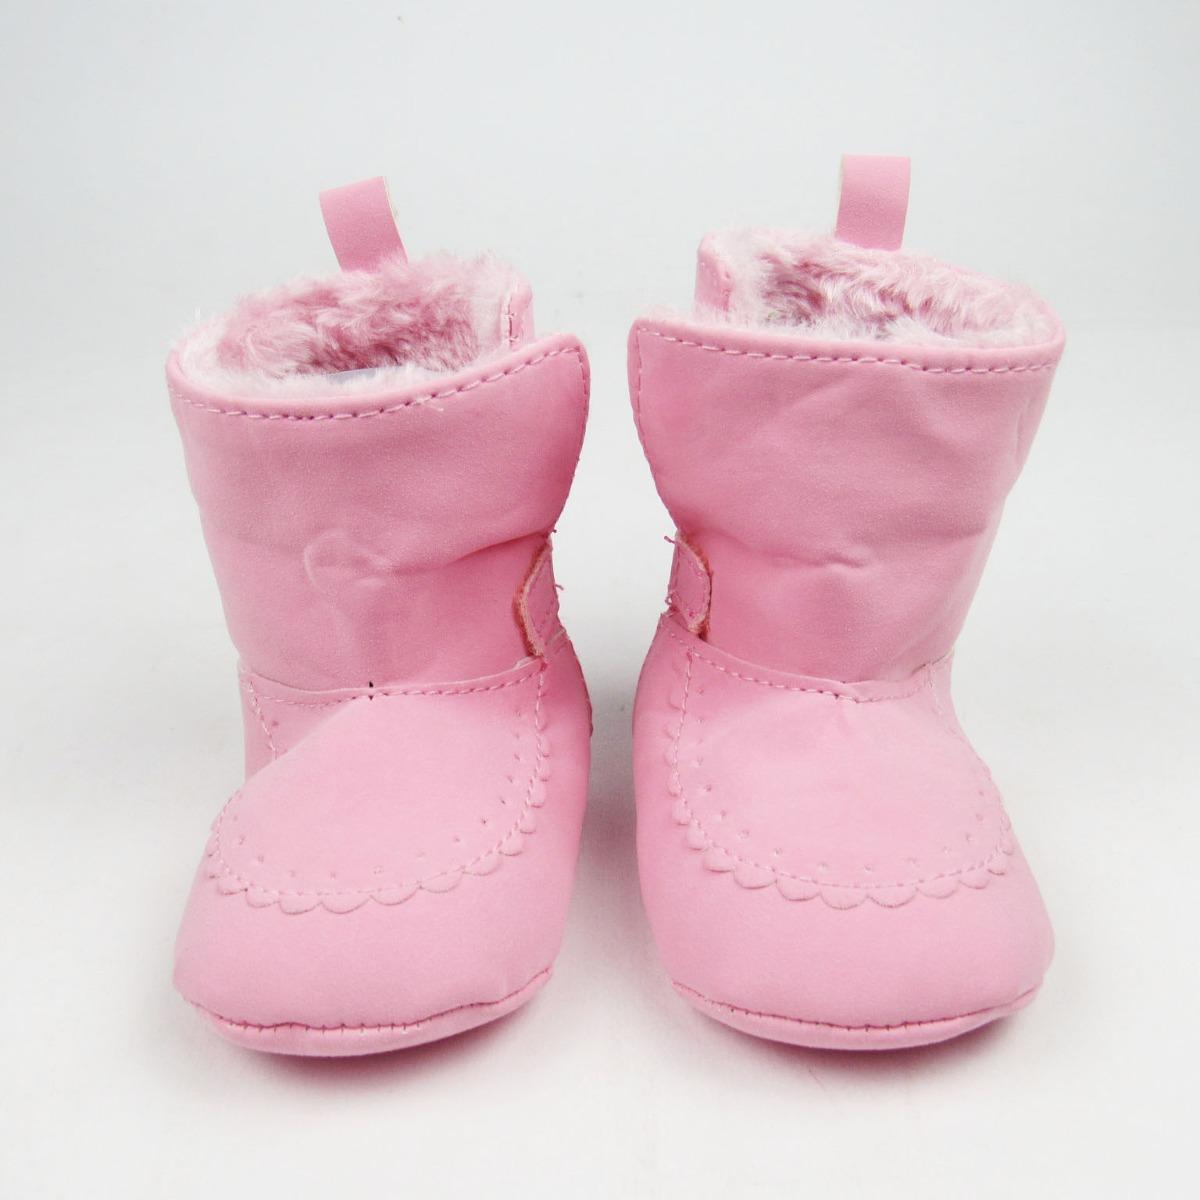 ea196deaae bota bebê feminina pelúcia rosa. Carregando zoom.